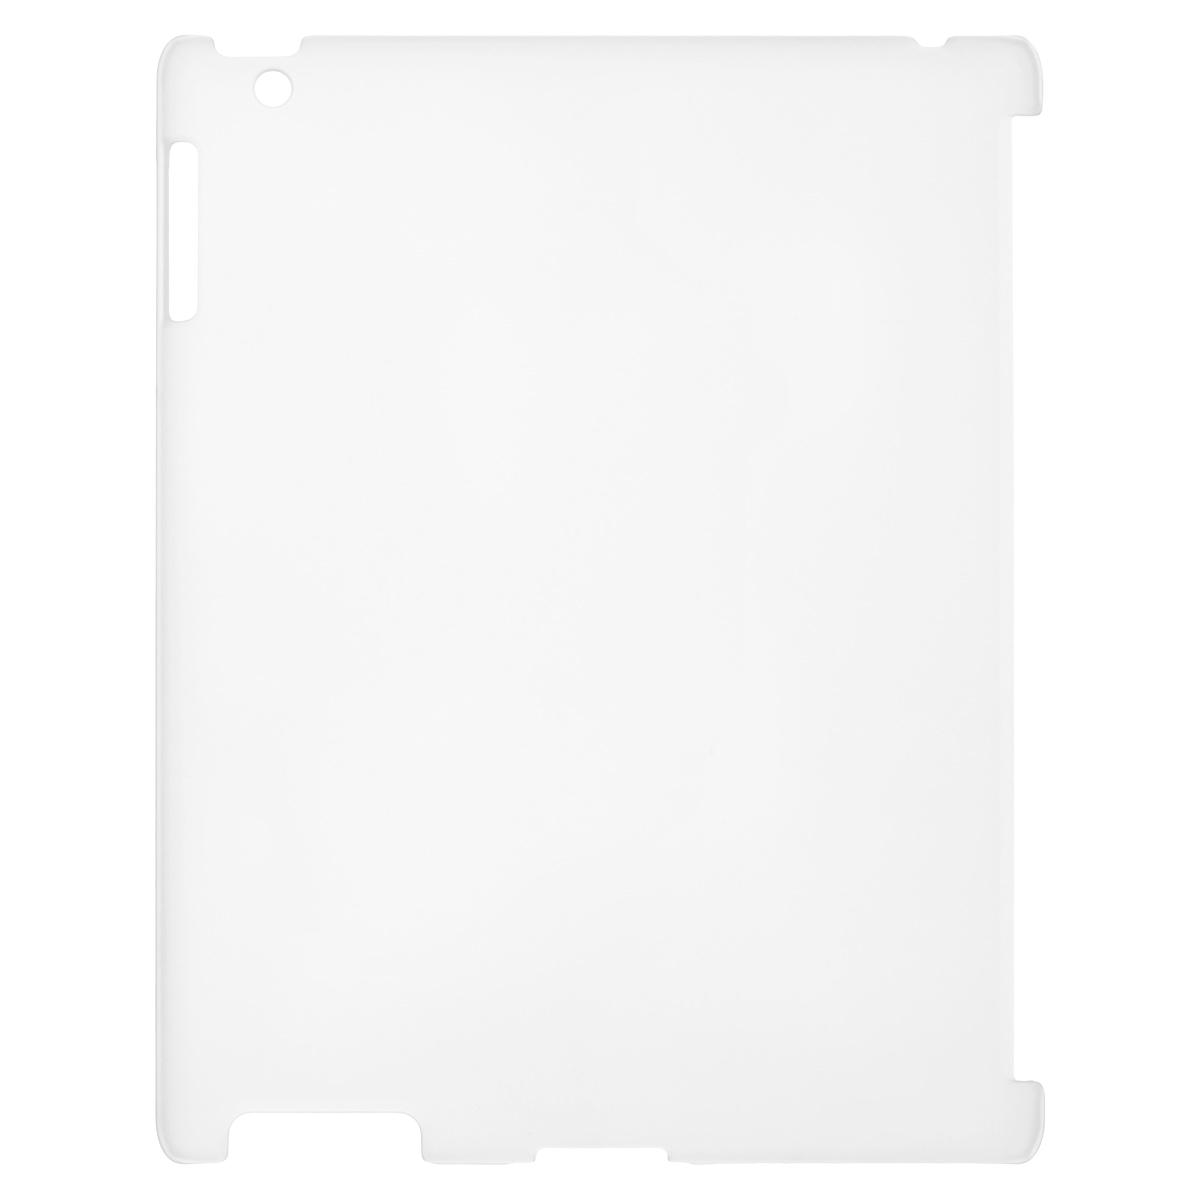 Black Horns чехол для iPad2, White (BH-iD2201) стоимость